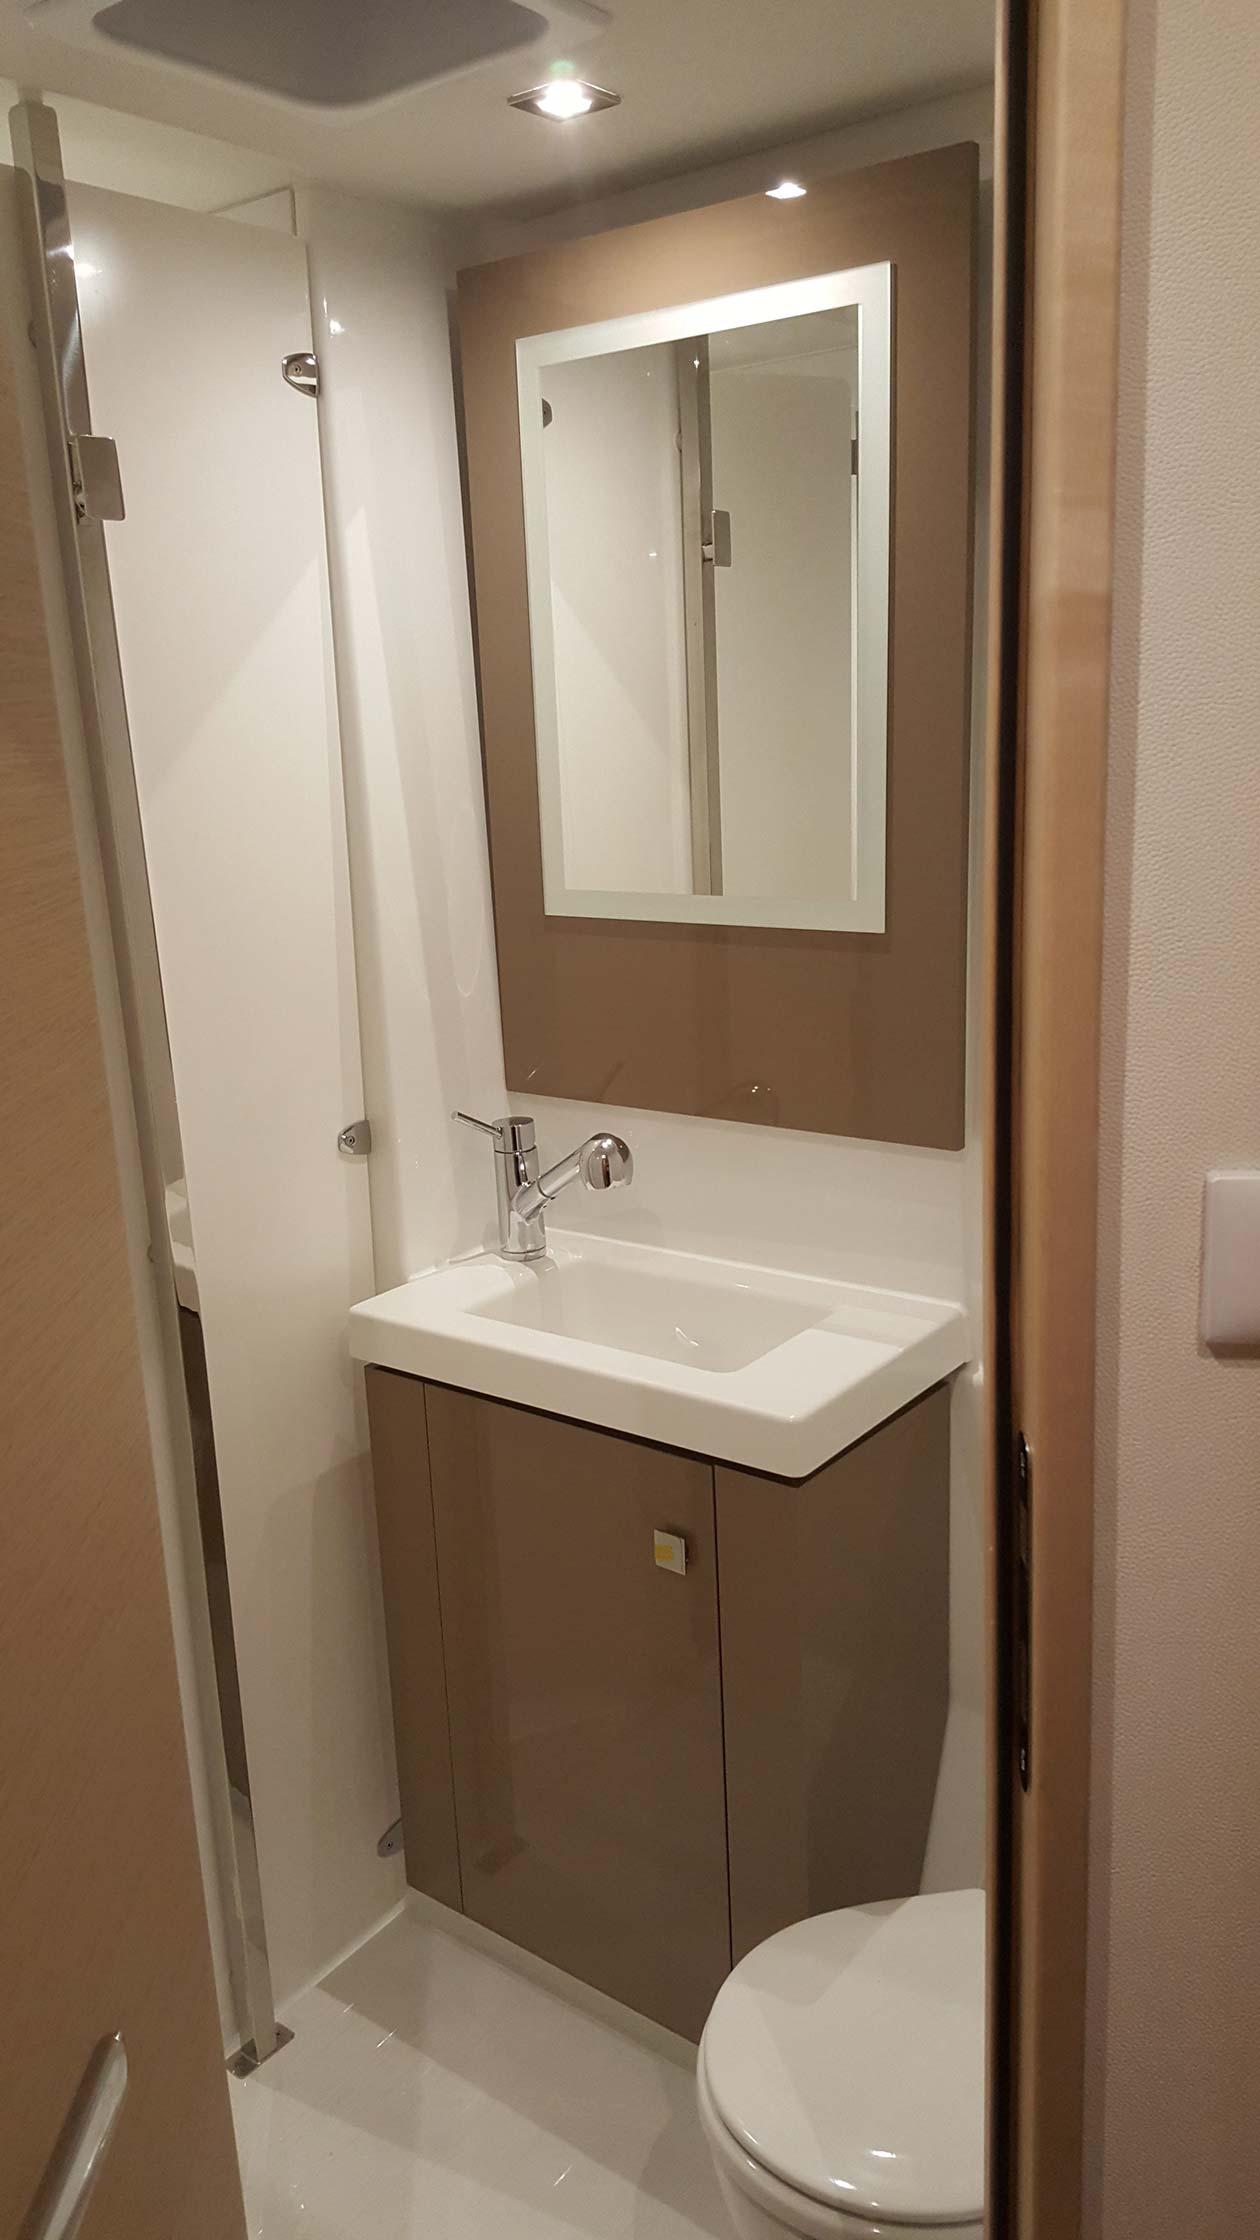 Nautimob - Espace salle de bain